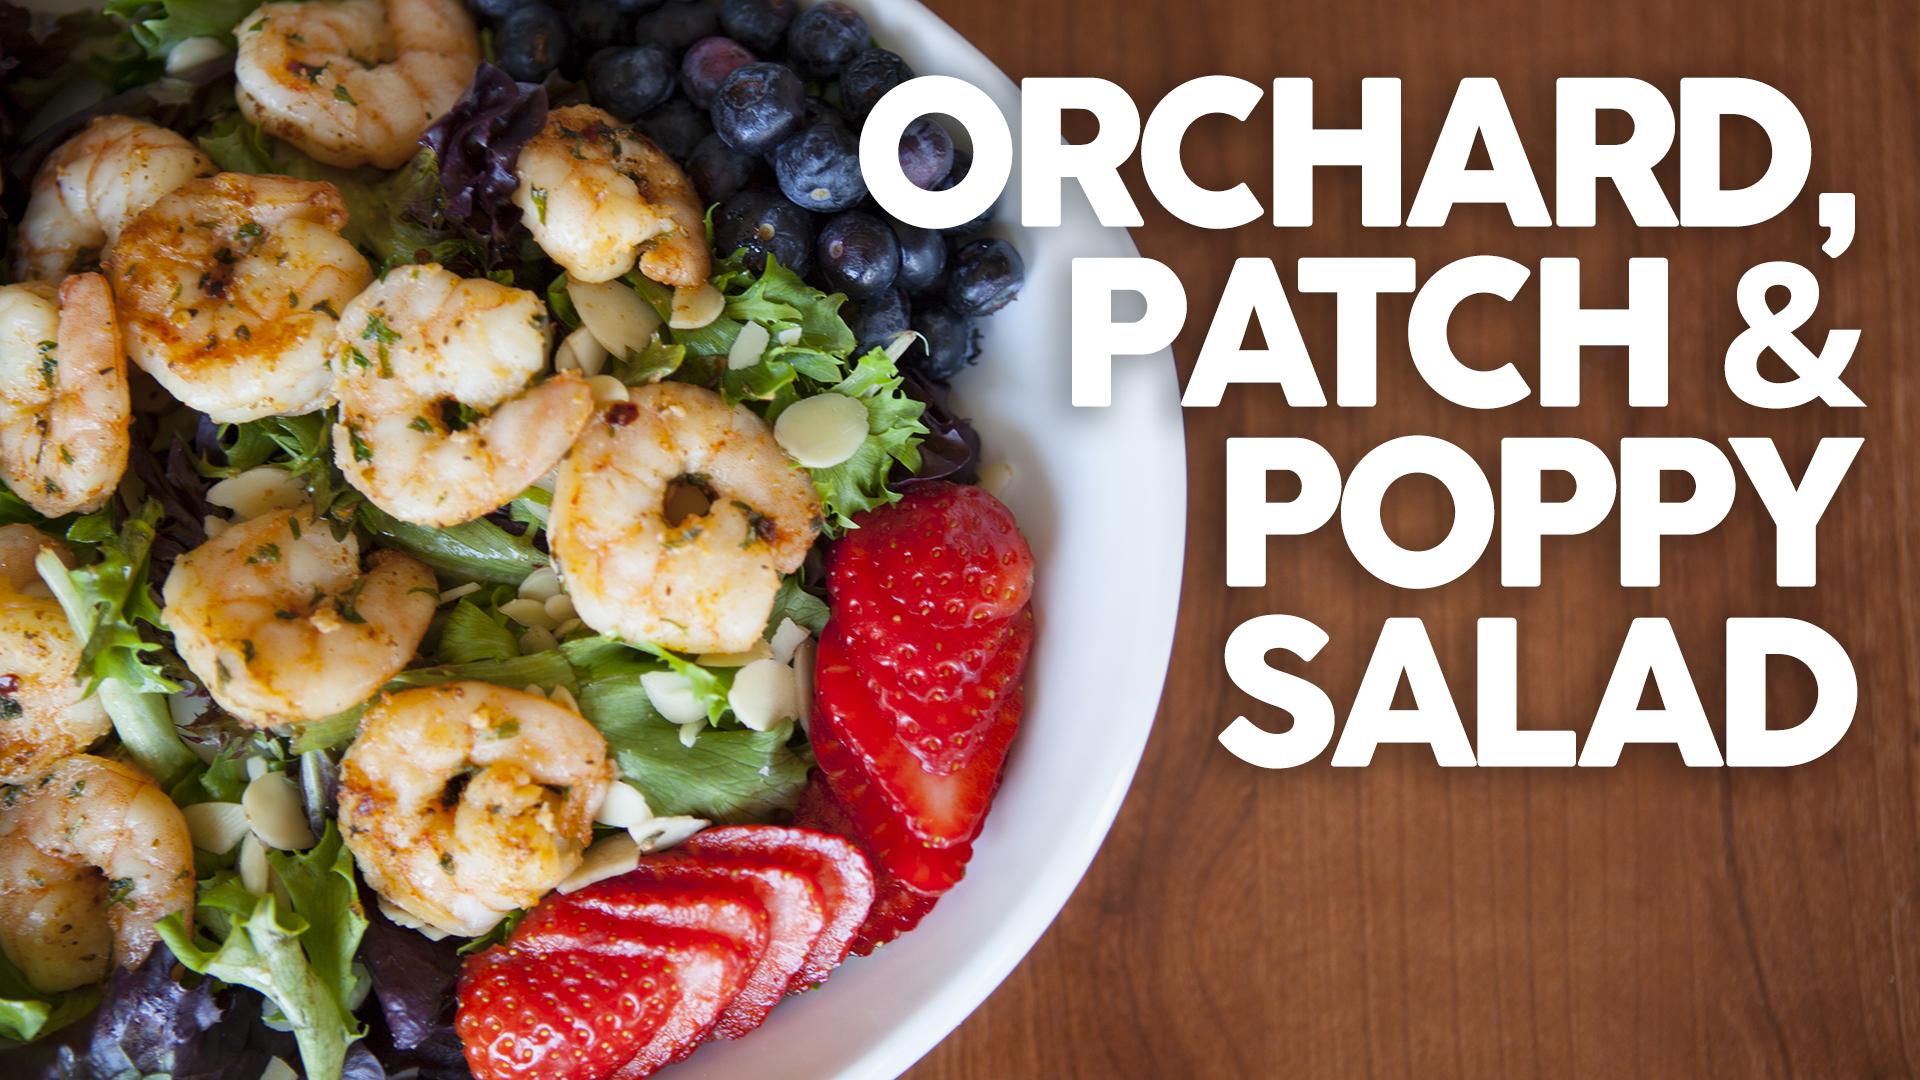 Orchard, Patch & Poppy Salad